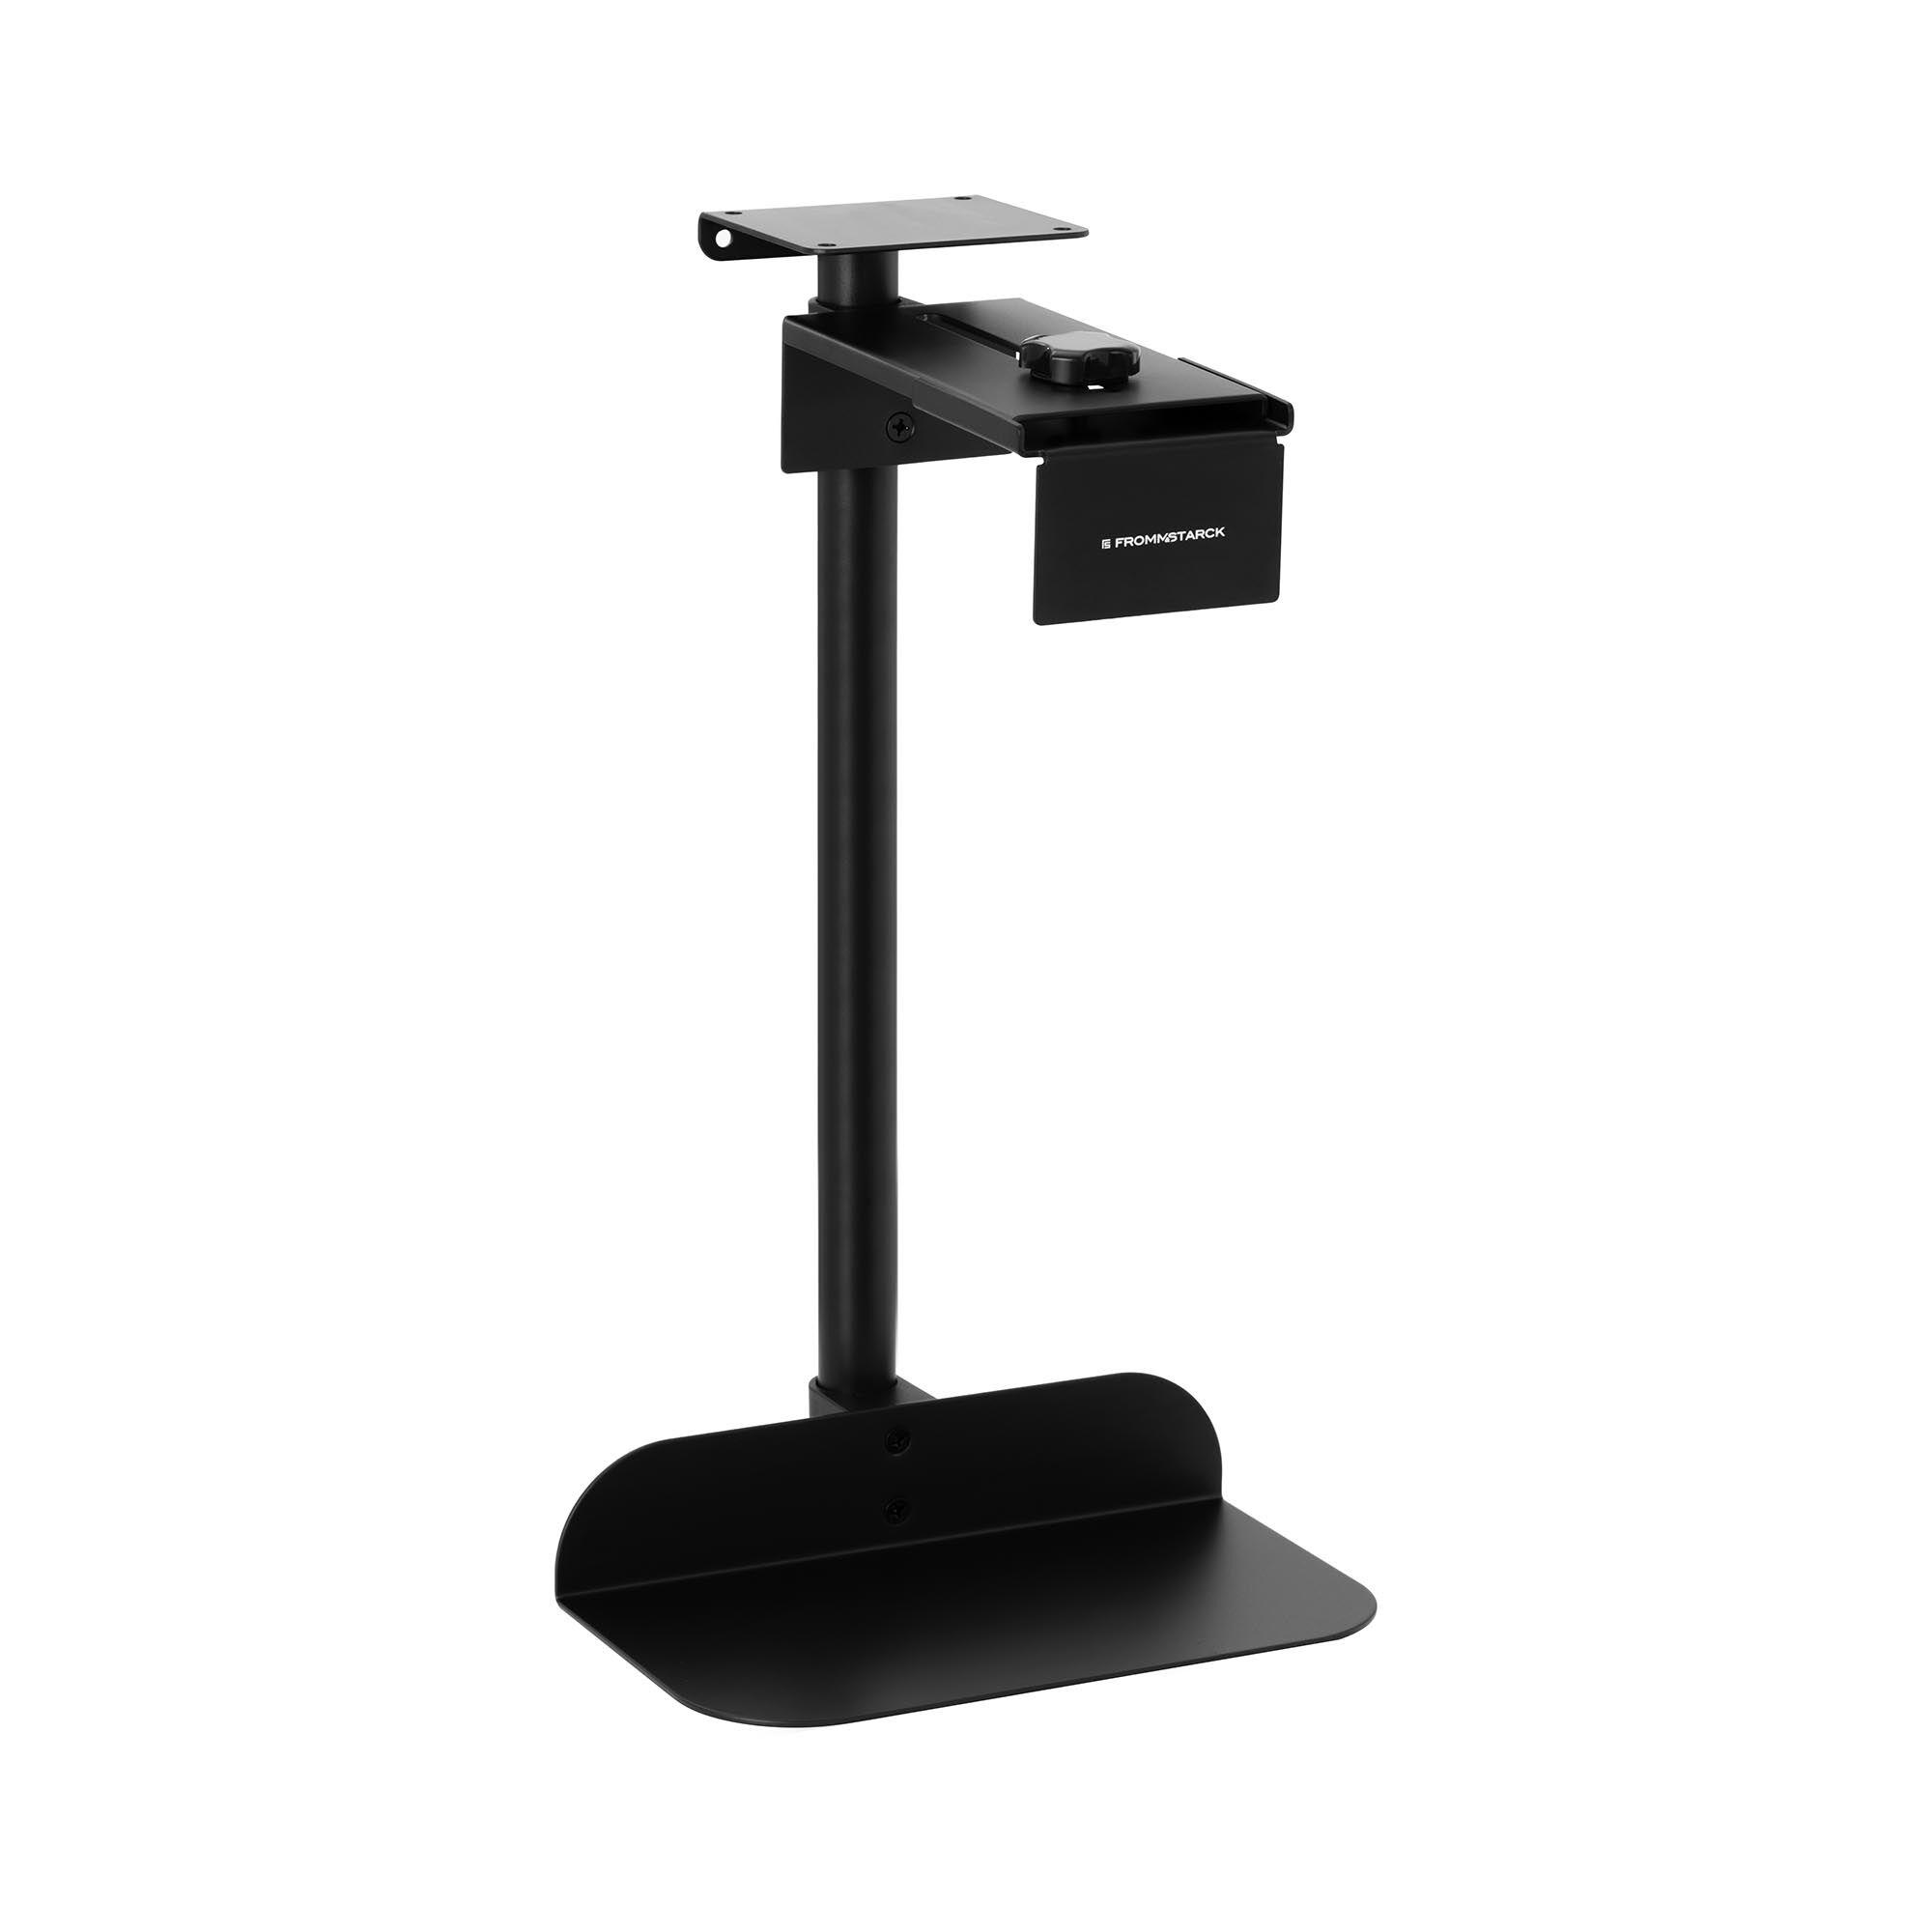 Fromm & Starck Computerholder til skrivebord - justerbar - 15 kg STAR_CHH_02